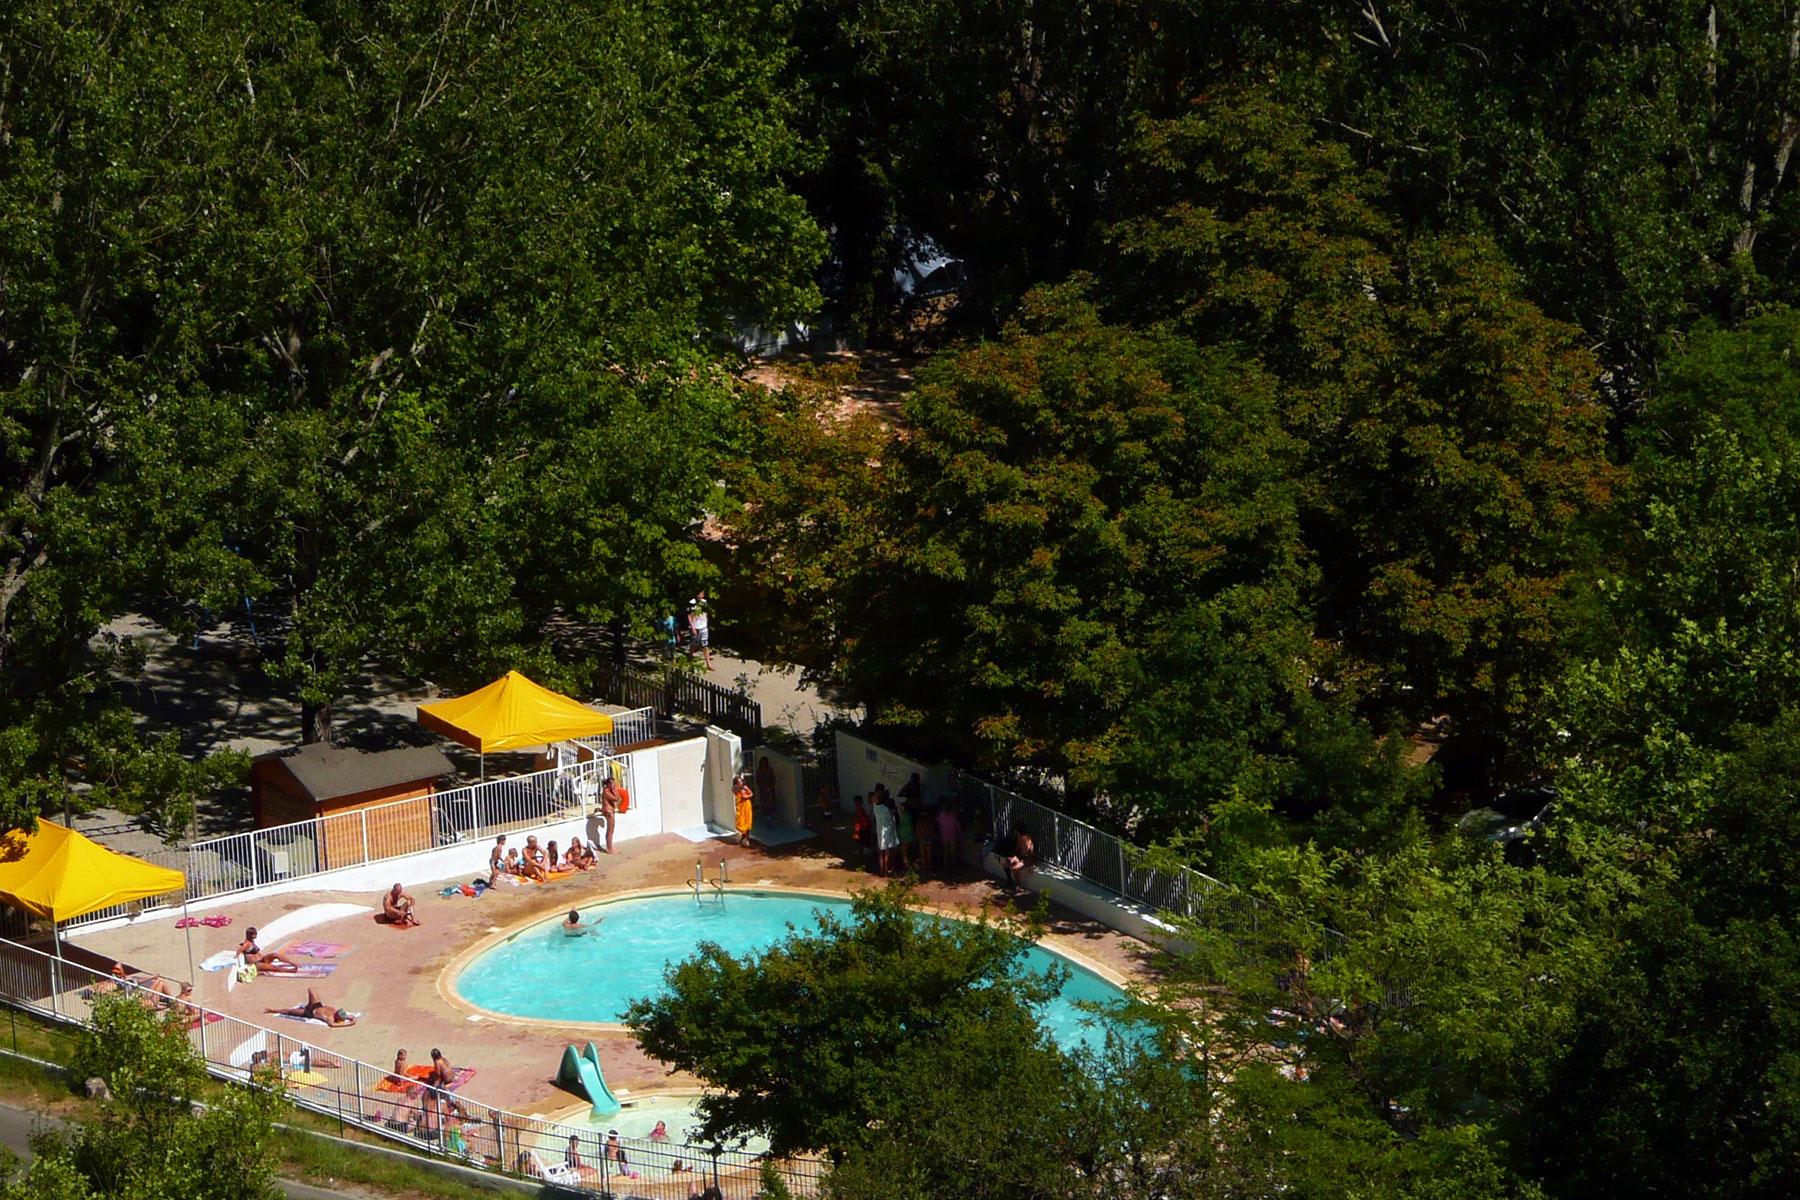 camping verdon piscine chauffée